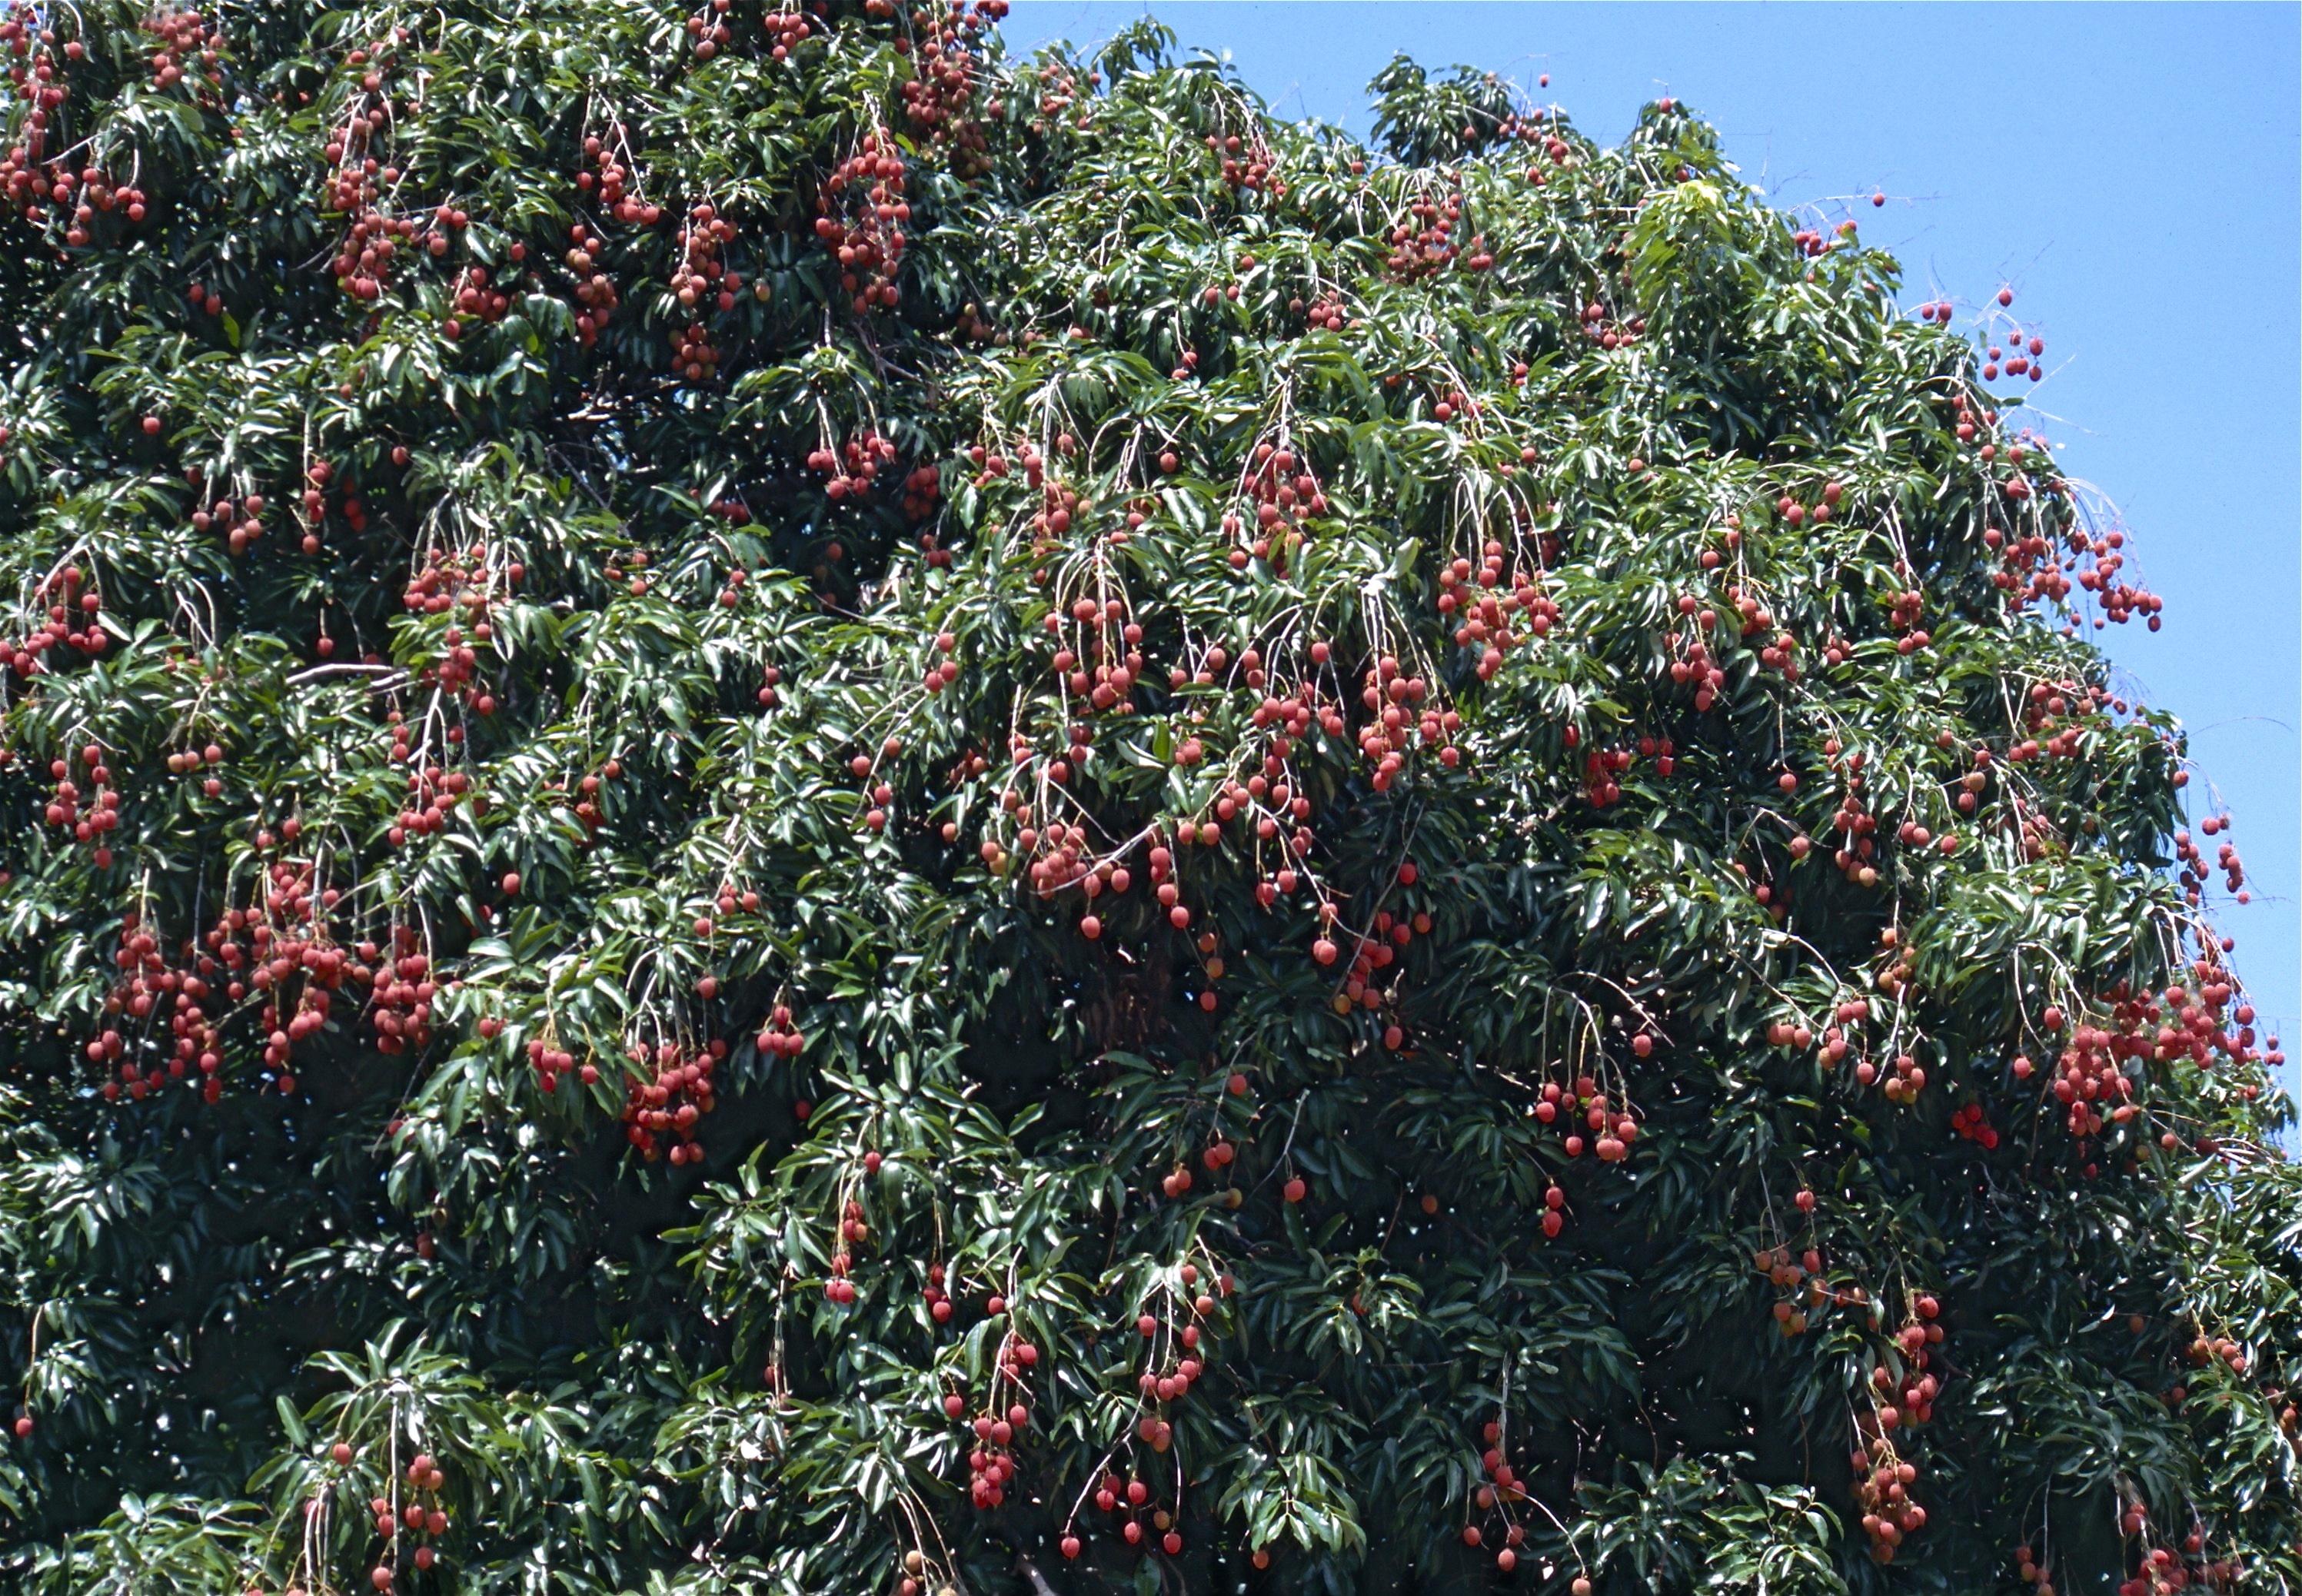 LICHI TREE IN DEHRADUN